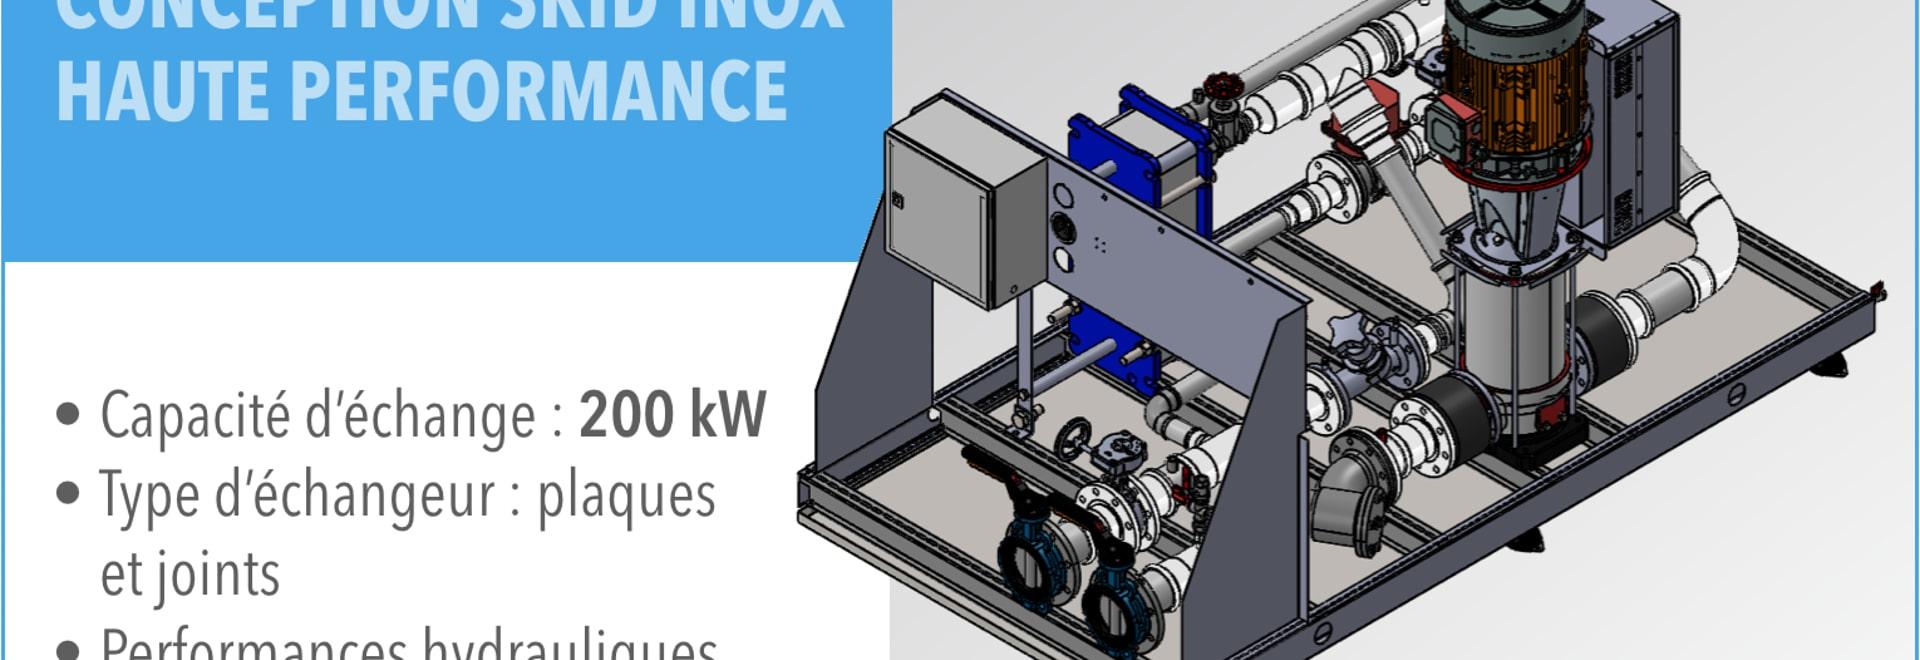 EURODIFROID x @CERN // Skid hydraulique haute performance